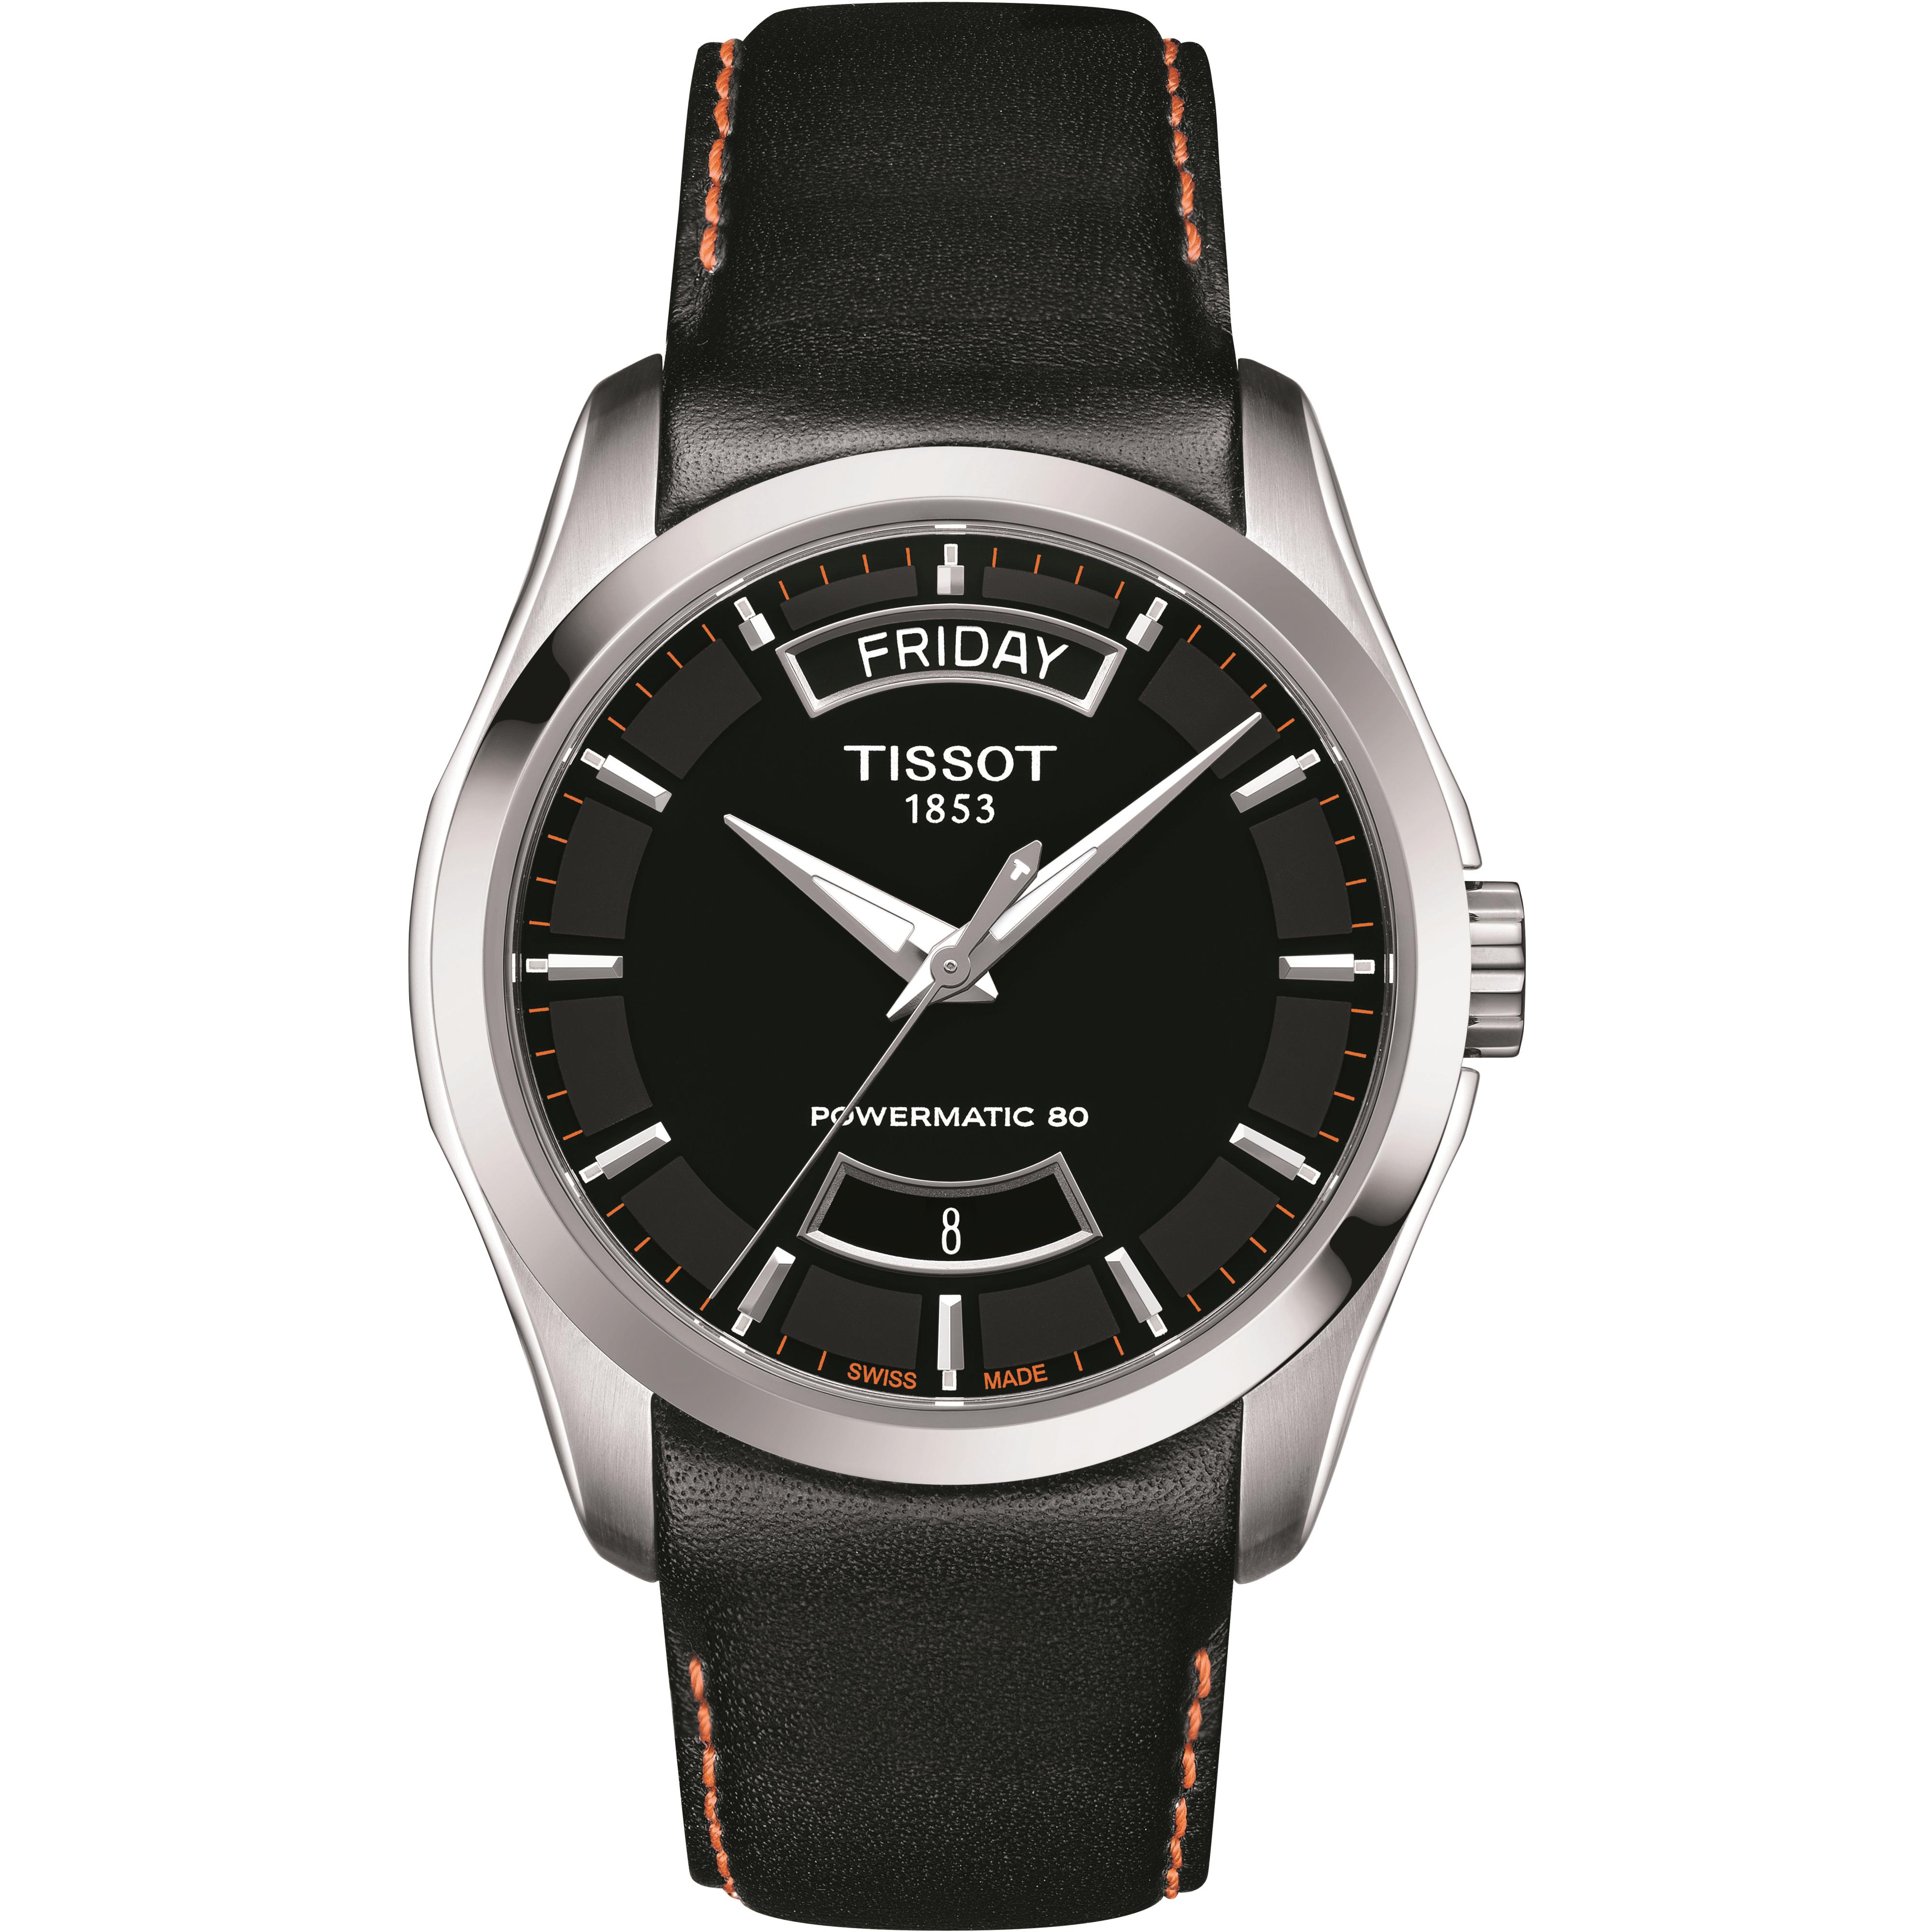 6eddd60a9 Gents Tissot Couturier Powermatic 80 Watch (T0354071605103) | WatchShop.com™